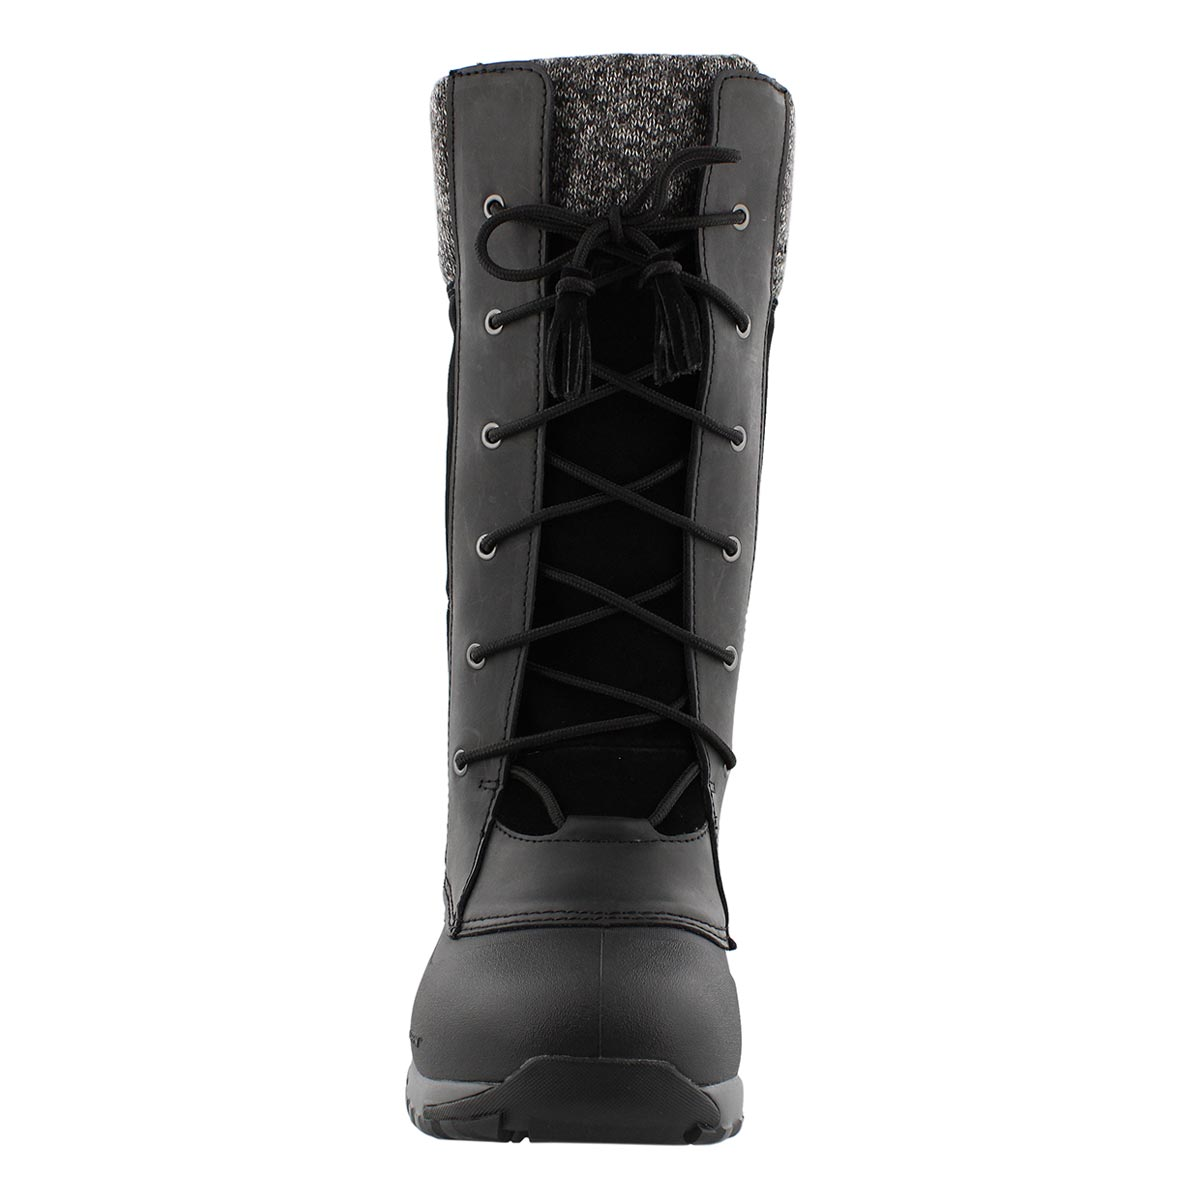 Lds Dana char lace up wtpf winter boot